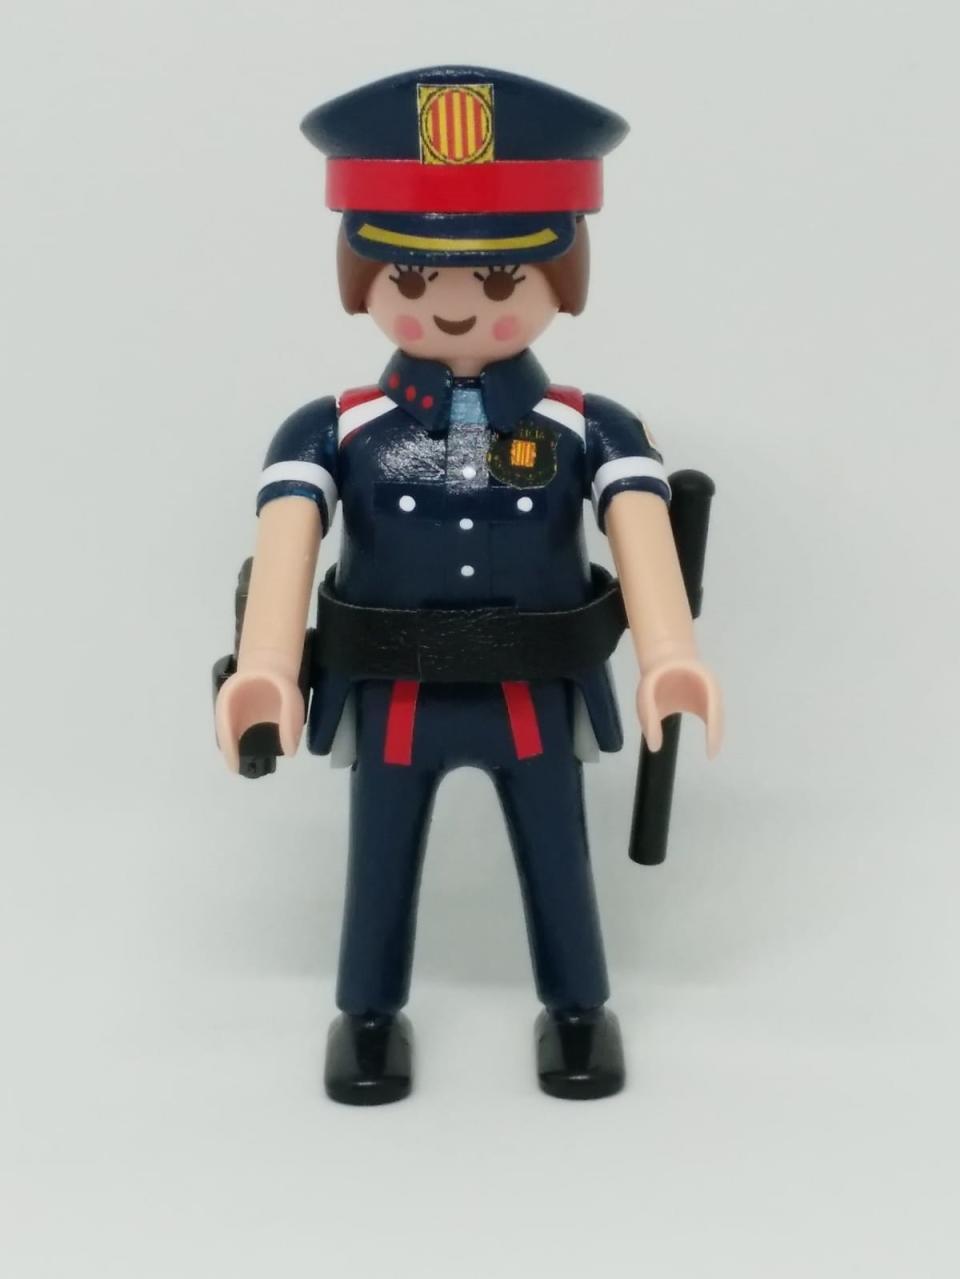 PLAYMOBIL PERSONALIZADO POLICÍA DE CATALUÑA MOSSOS D´ESQUADRA NUEVO UNIFORME MUJER